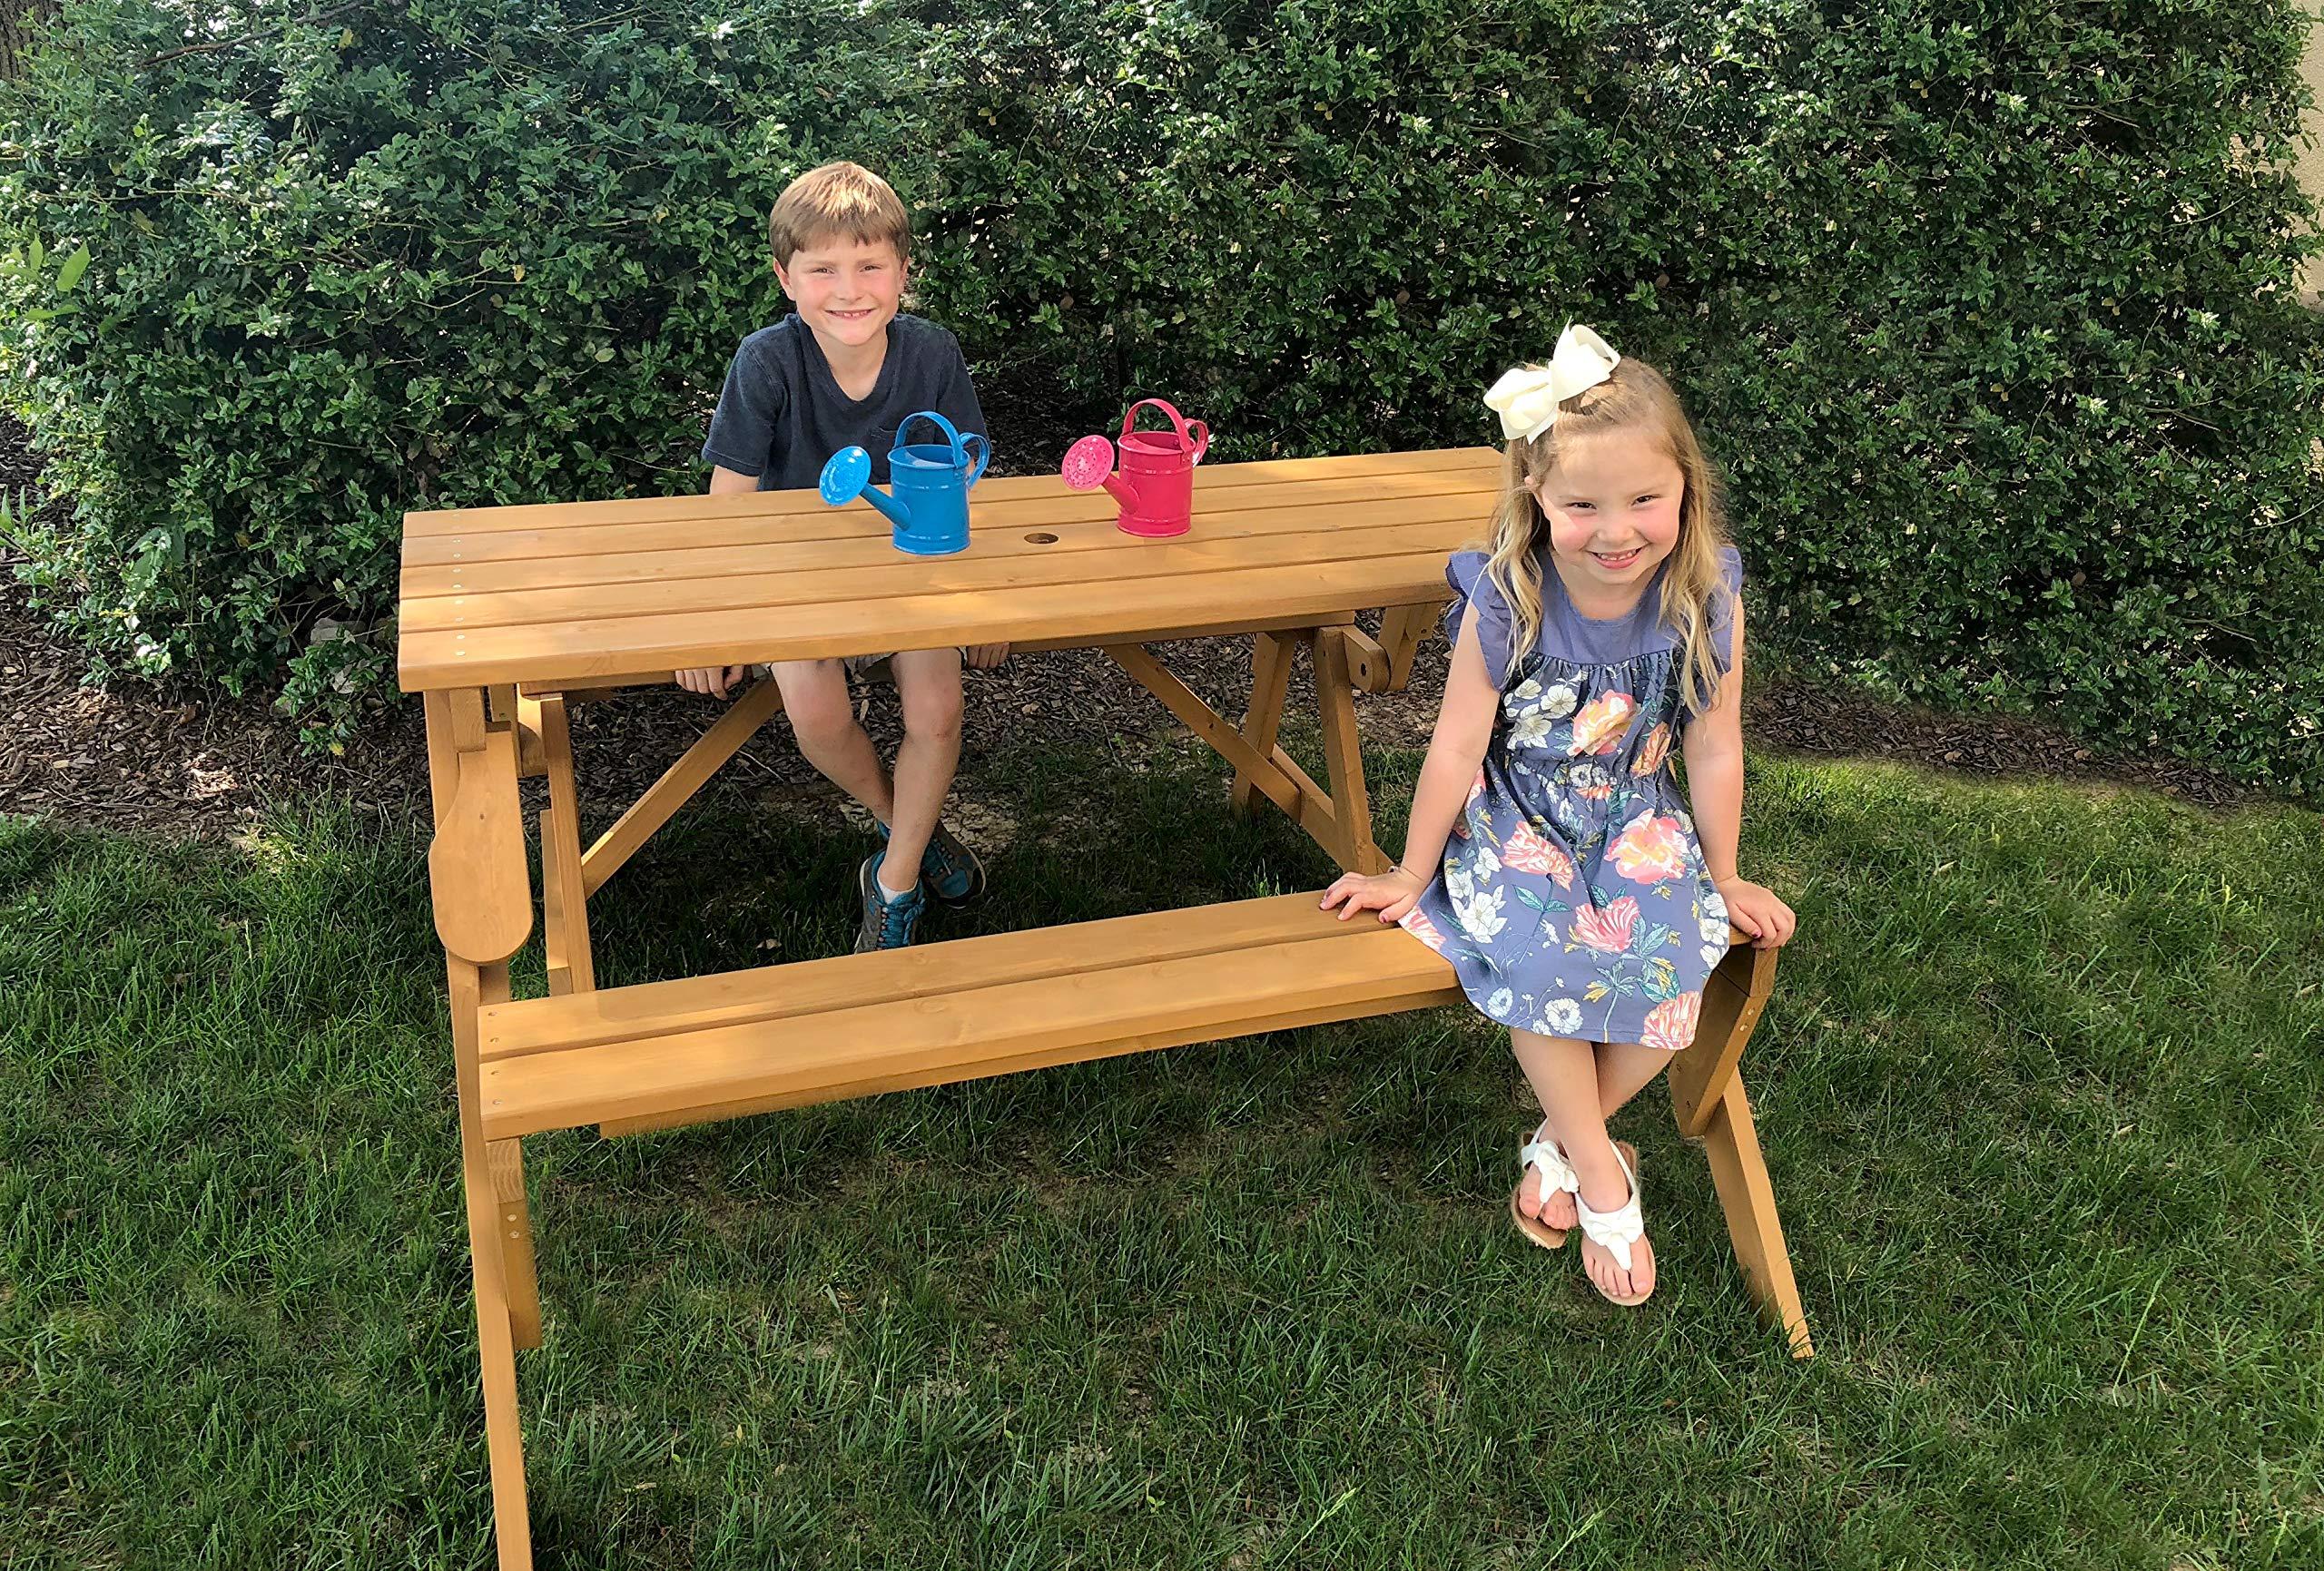 Tierra Garden 2-in-1 Convertible Junior Picnic Table/Bench by Tierra Garden (Image #4)